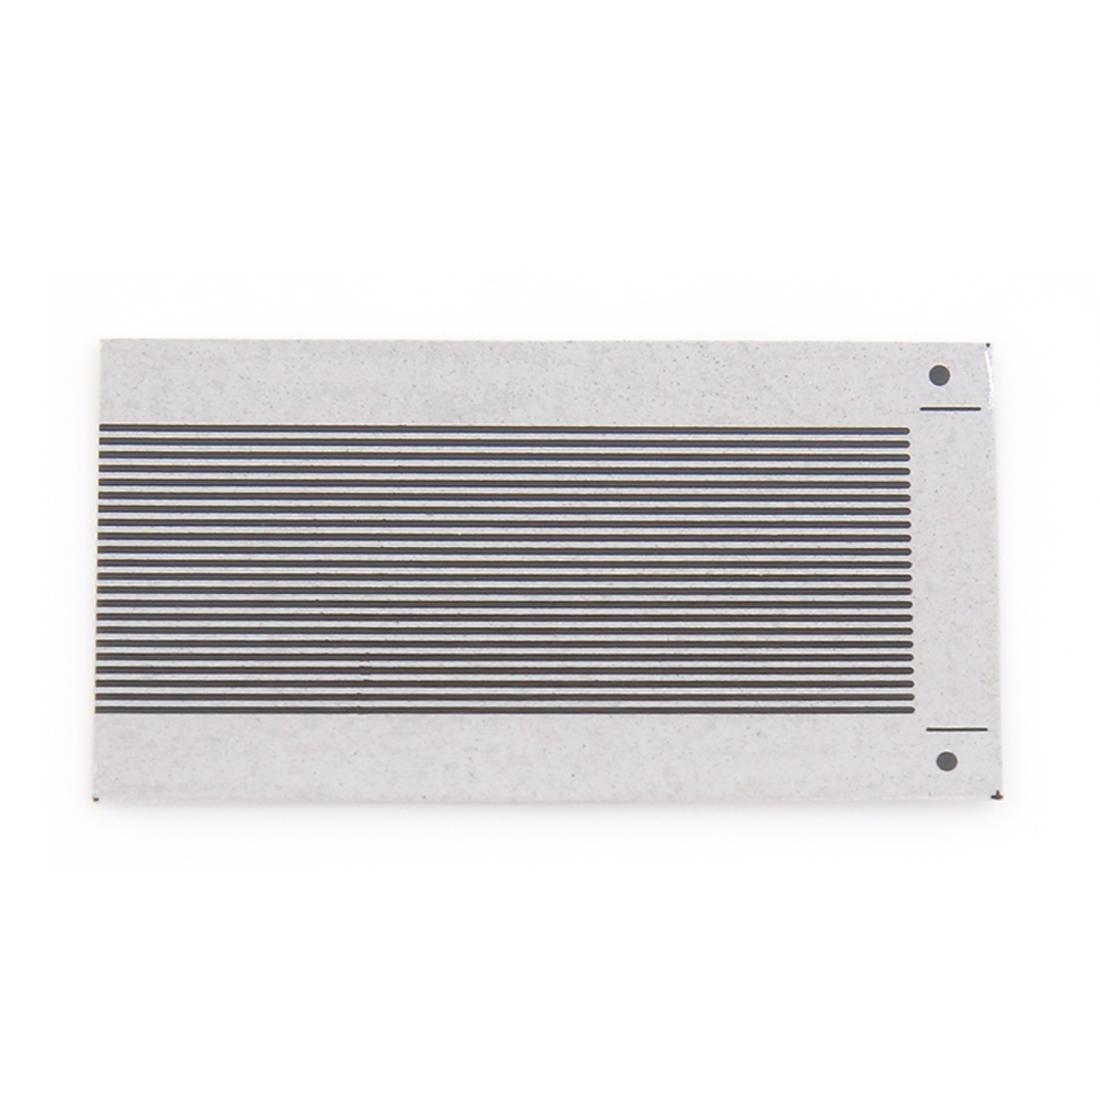 Air Conditioner Unit Ribbon Cable LCD Pixel Display Repair for SAAB 9-3